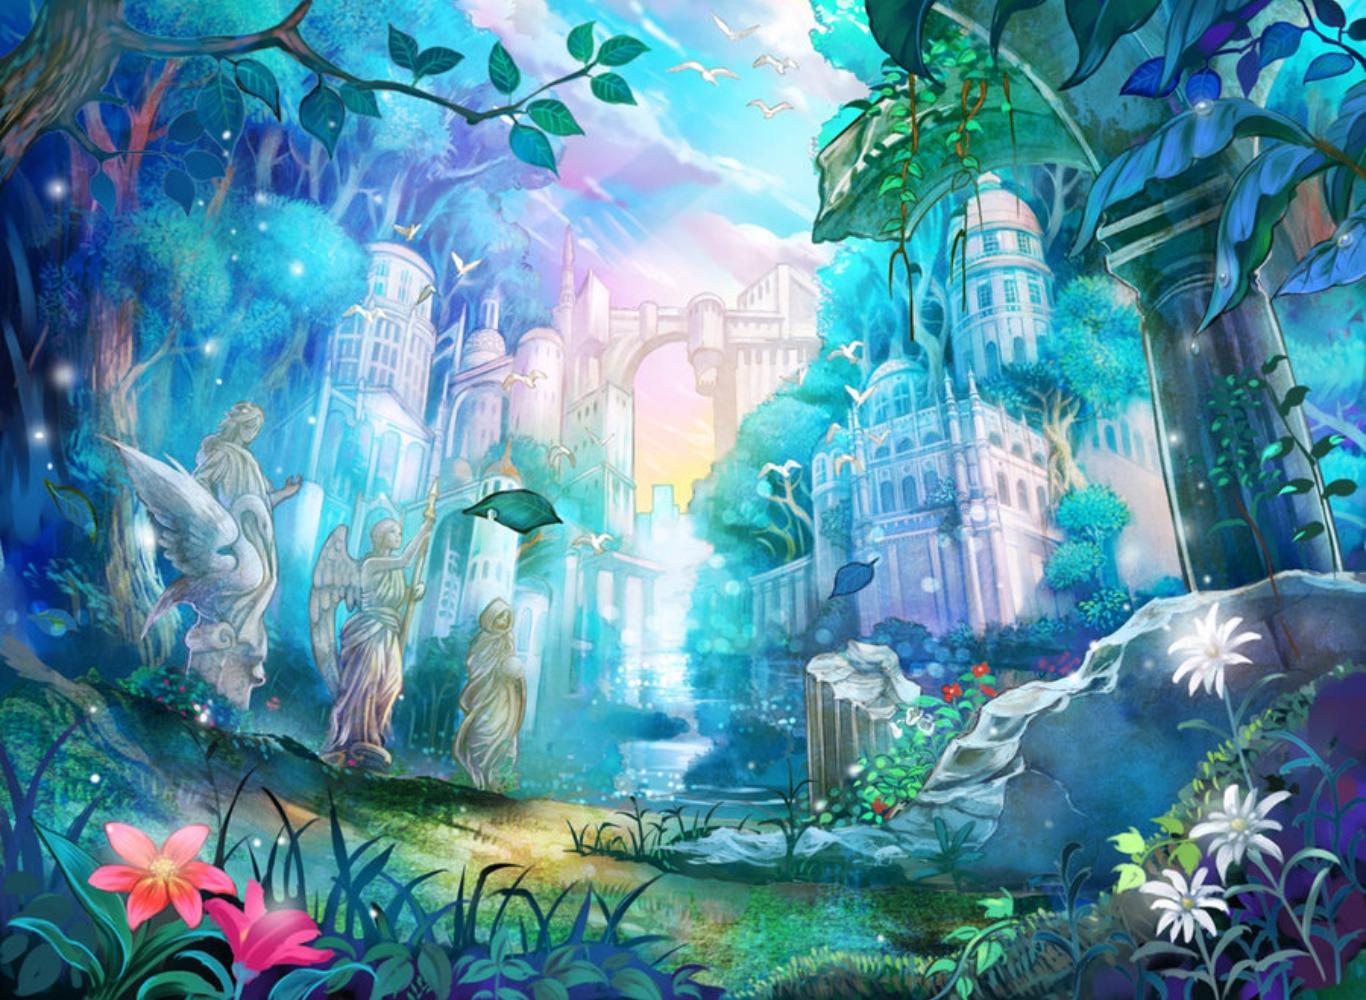 Hd Surrealism Wallpapers Artworks Background Art Cool - Fantasy Kingdom Painting Art - HD Wallpaper